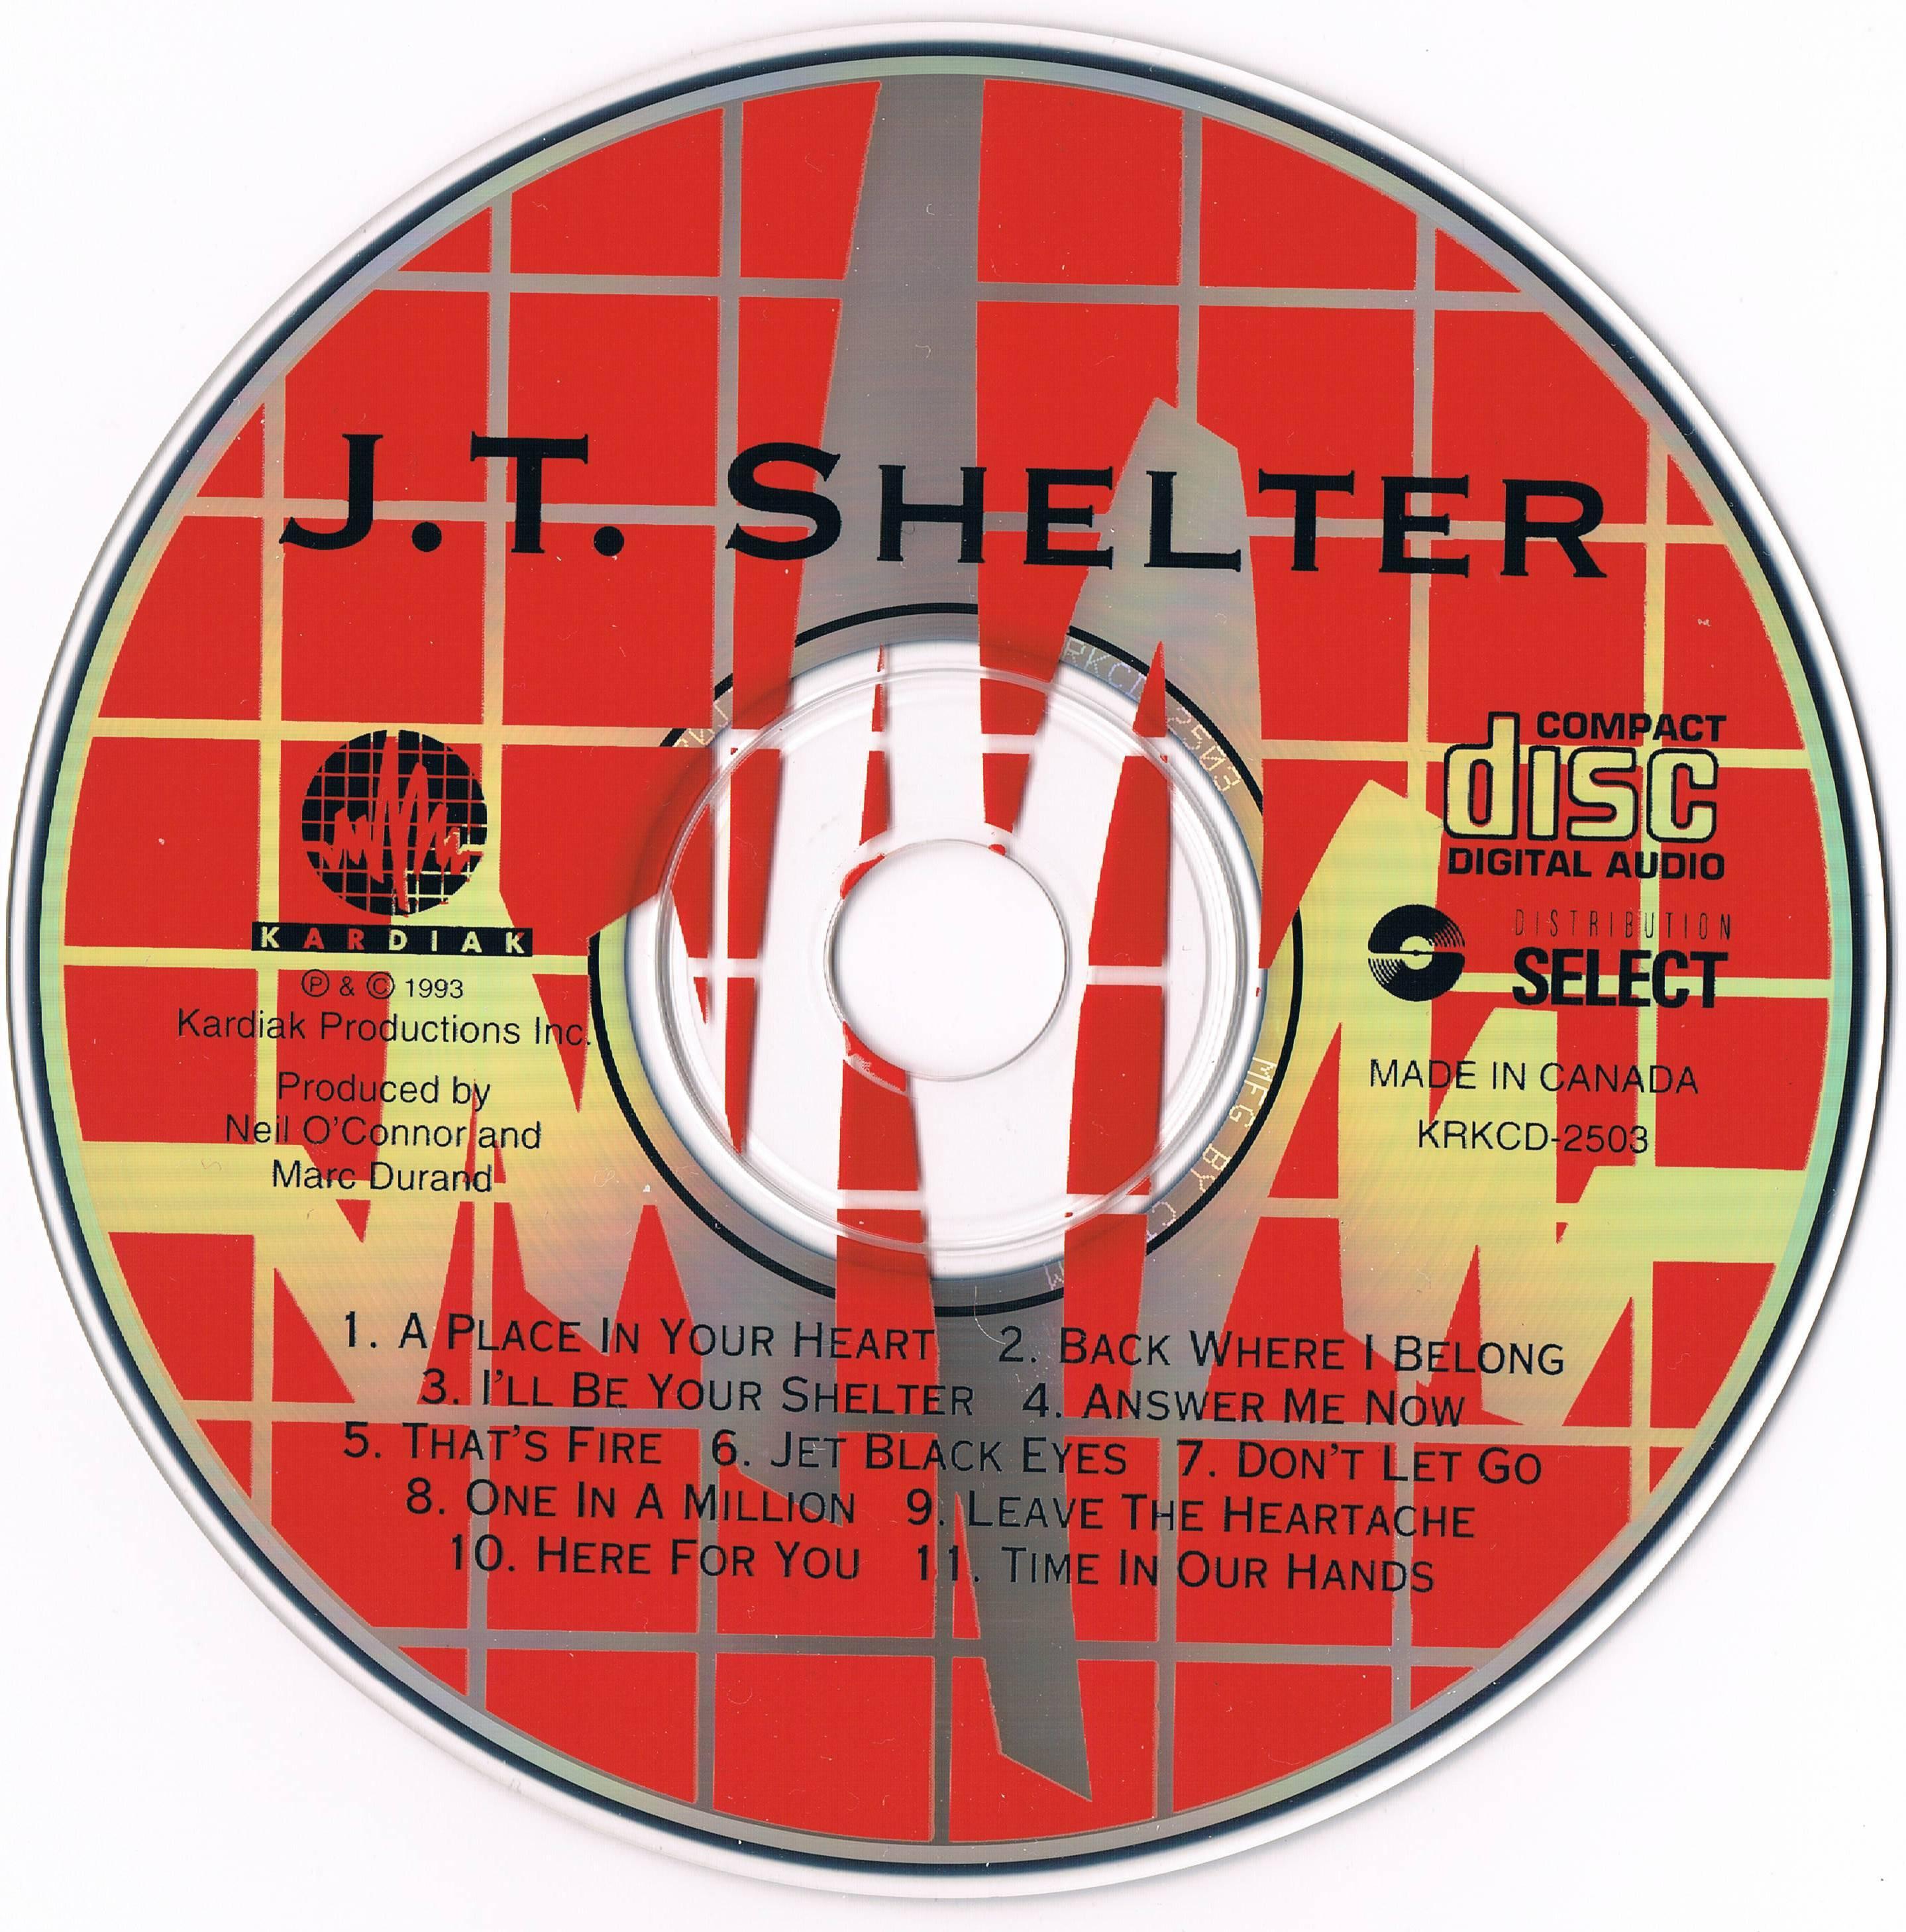 J.T. Shelter - J.T. Shelter (1993)